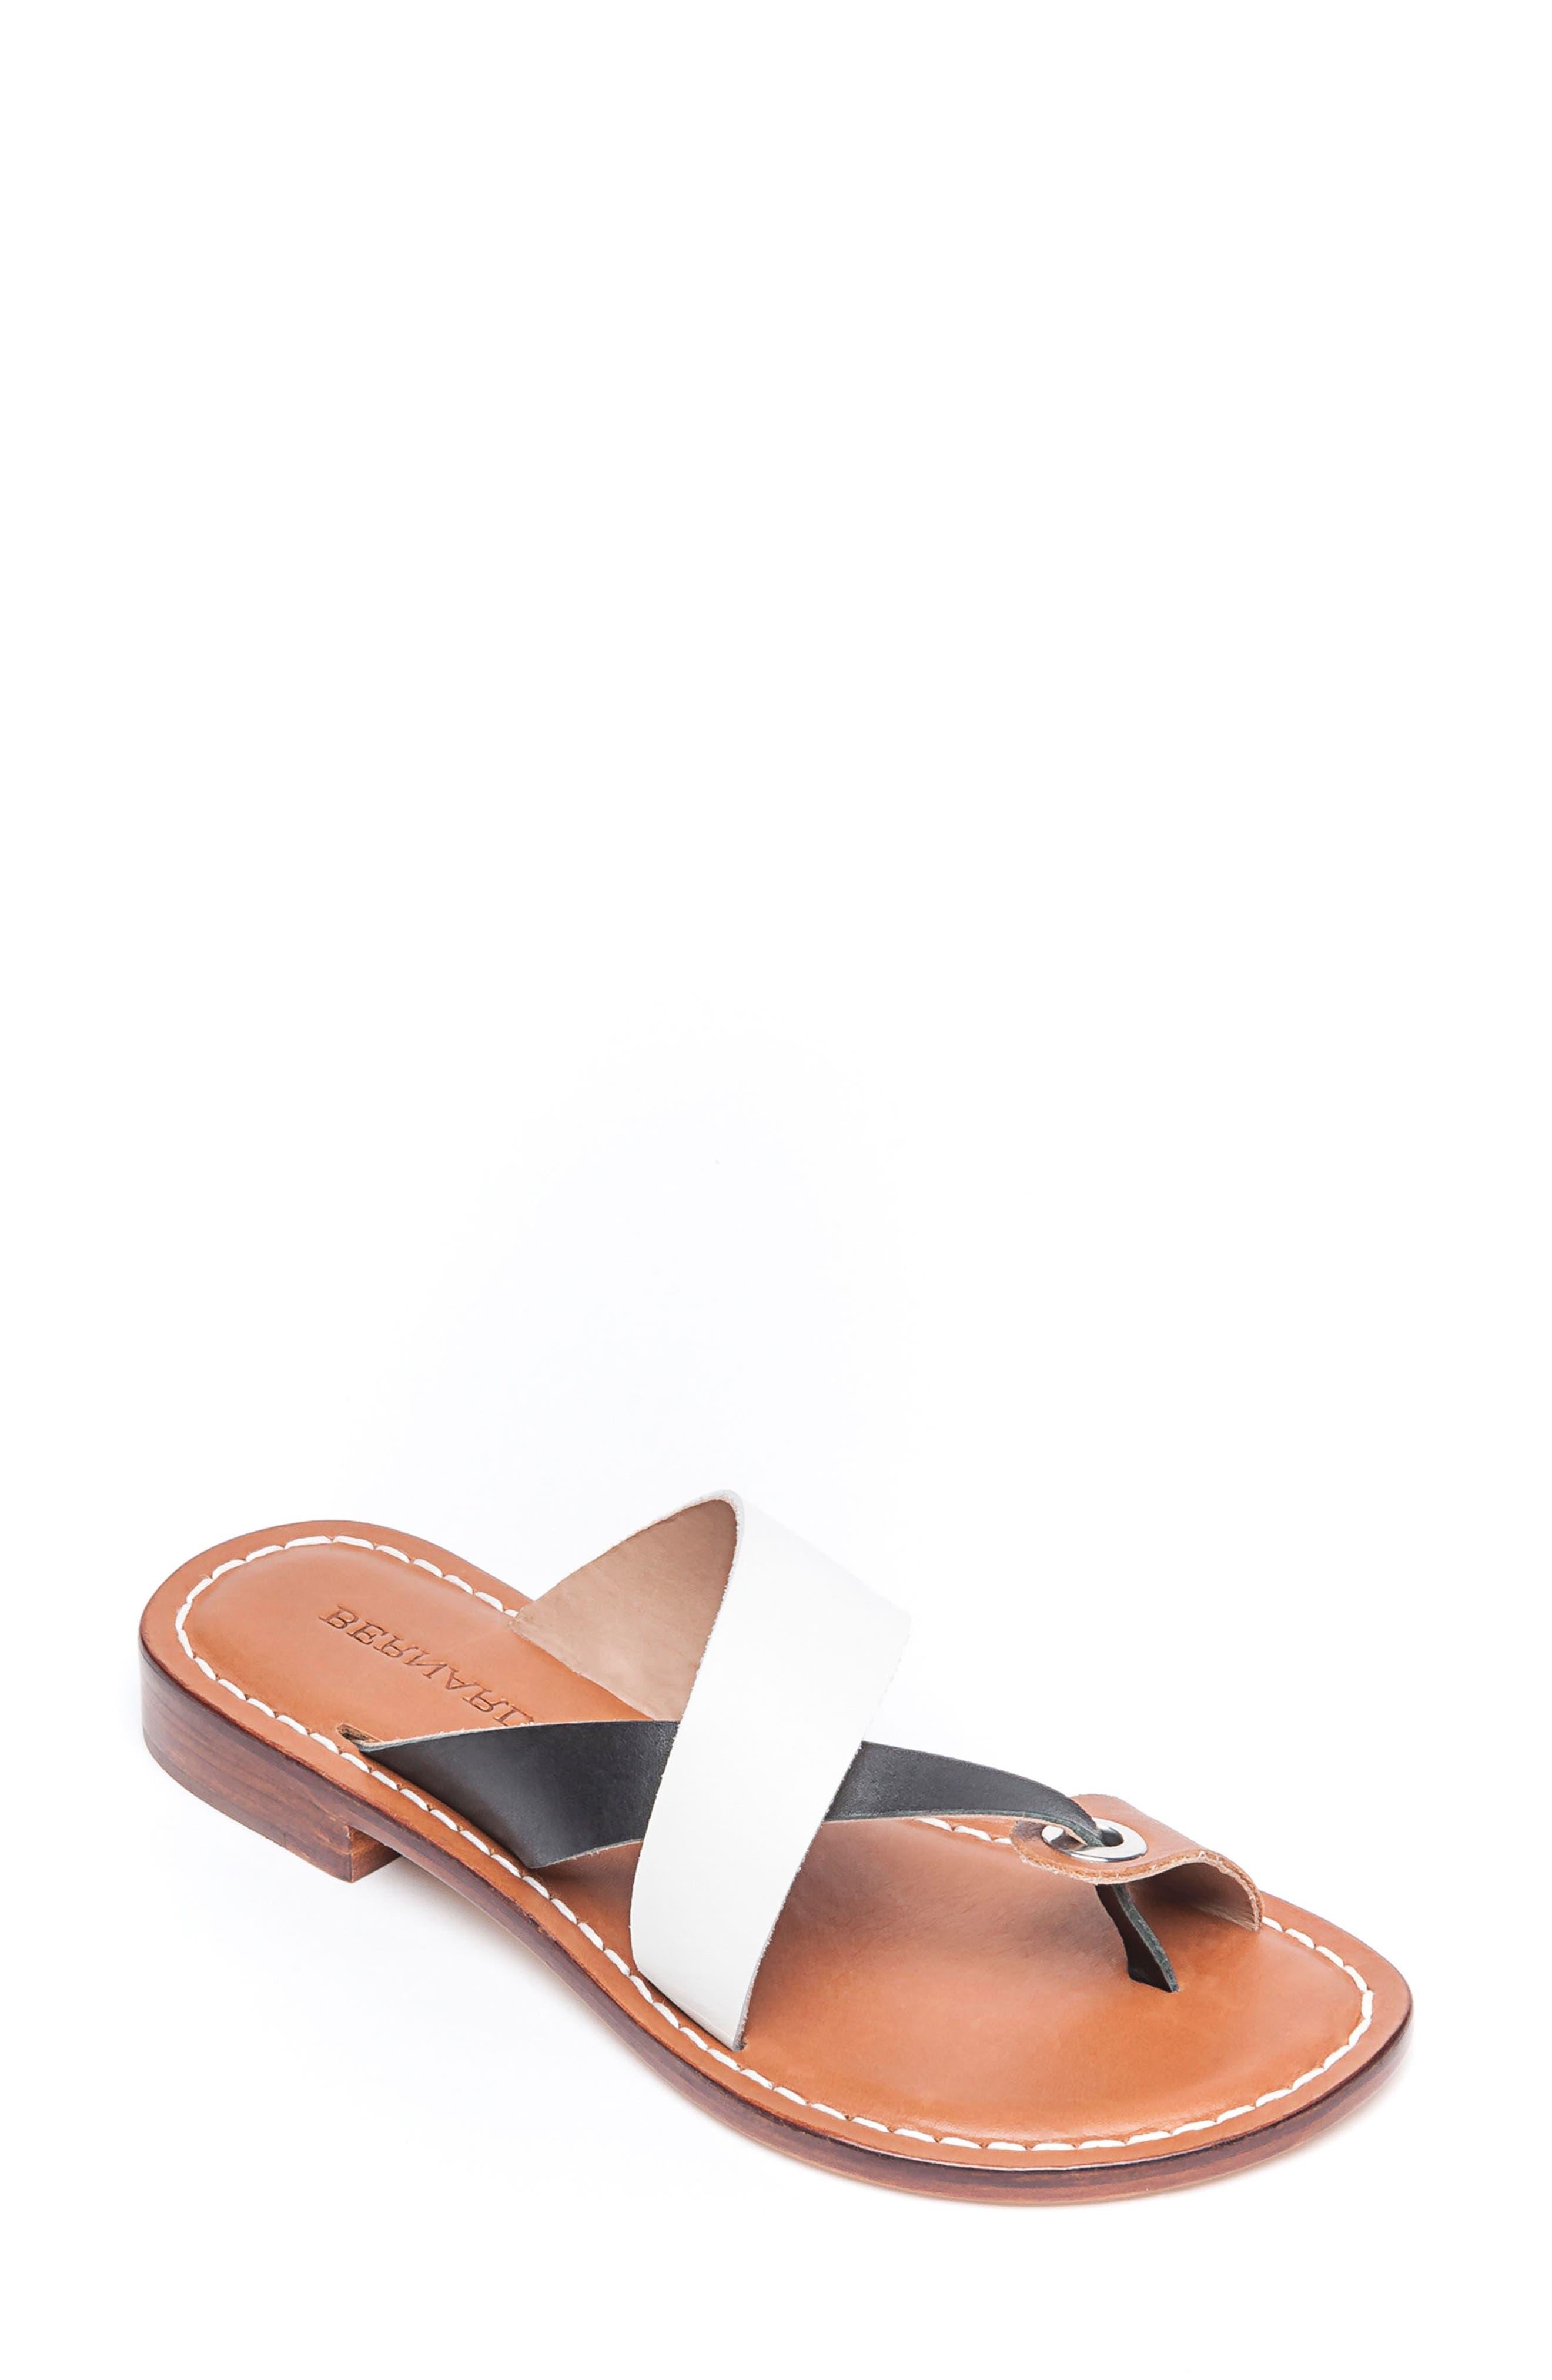 BERNARDO Tia Sandal, Main, color, WHITE/ BLACK/ LUGGAGE LEATHER